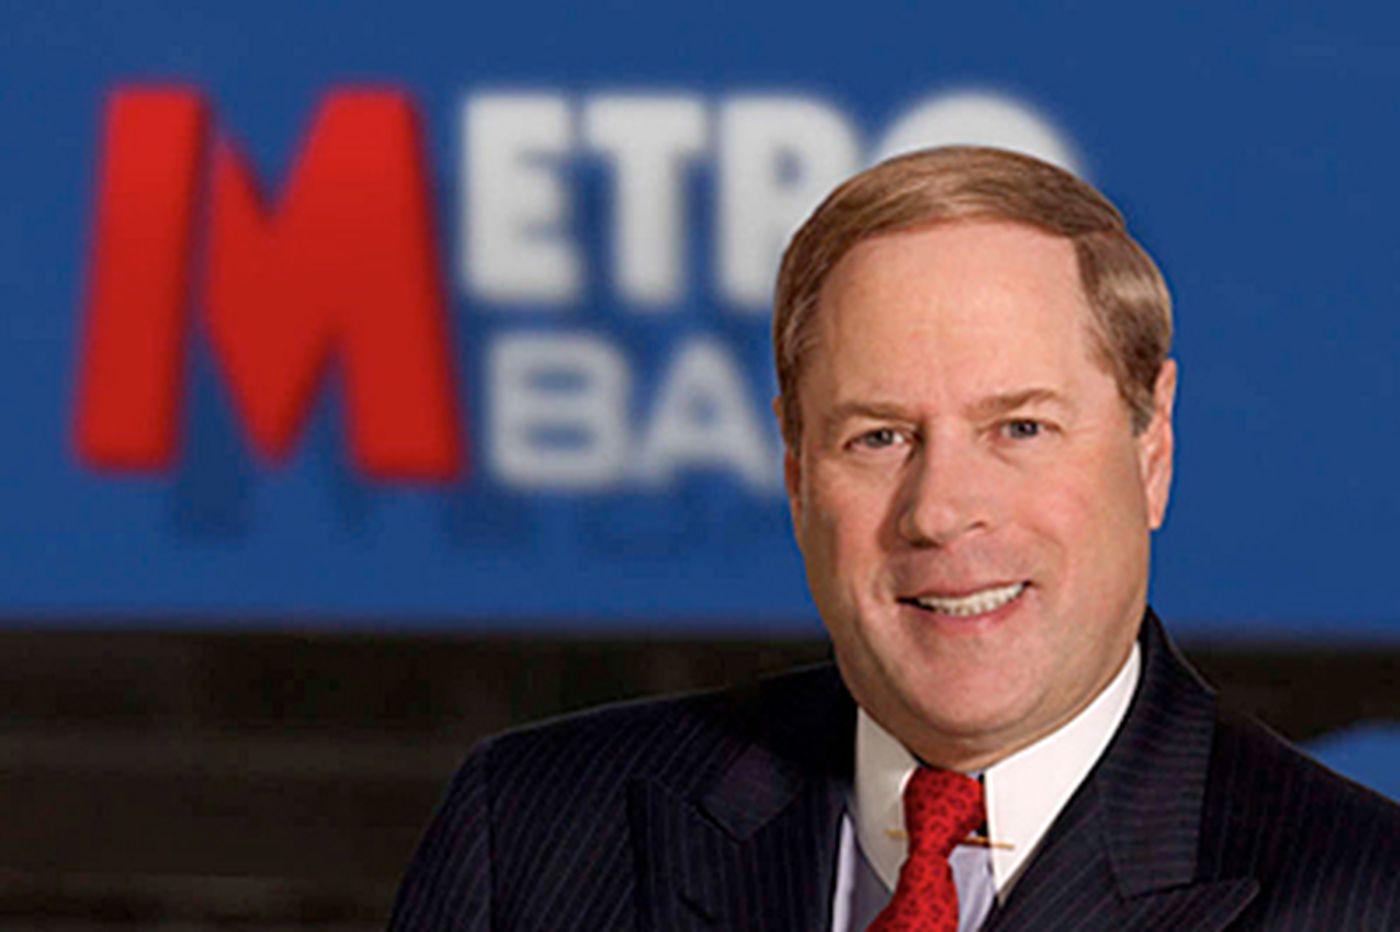 Larry Platt: A disrupter one can bank on